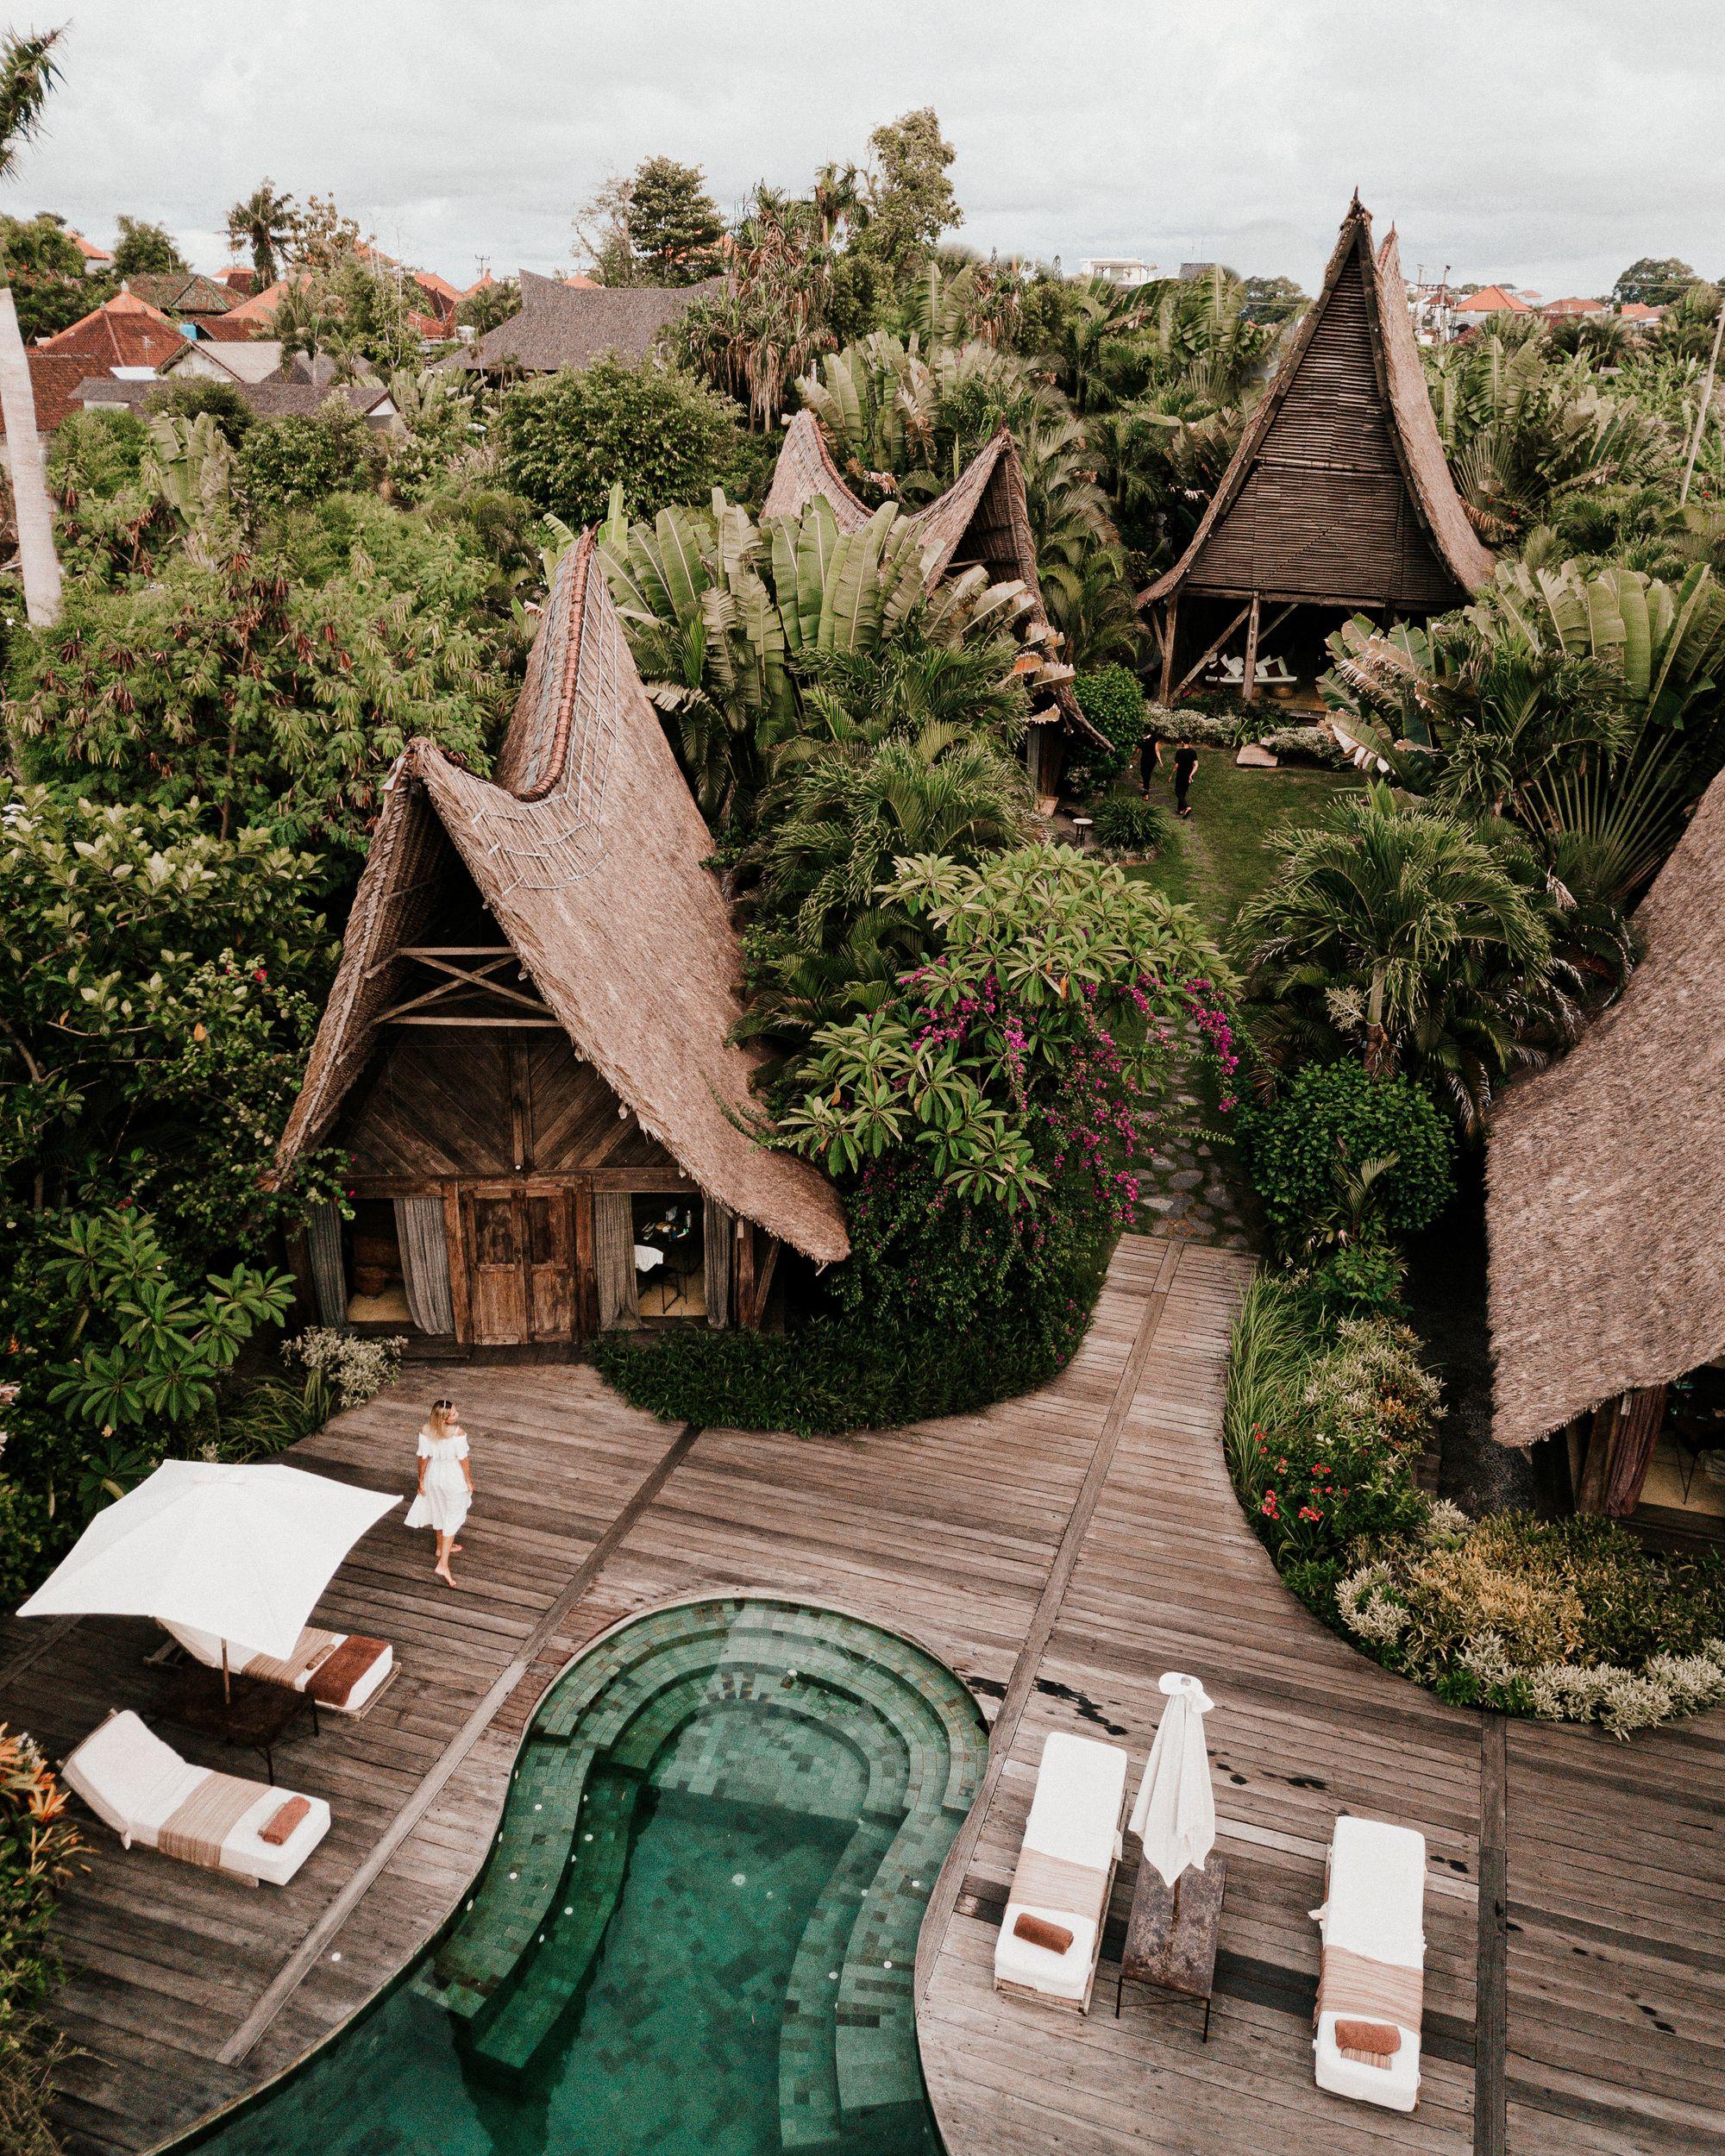 Drone Photograph Of Bucket List Destination In Bali Indonesia Design Home Eco Resort Own Villa Bali Bali Travel Honeymoon